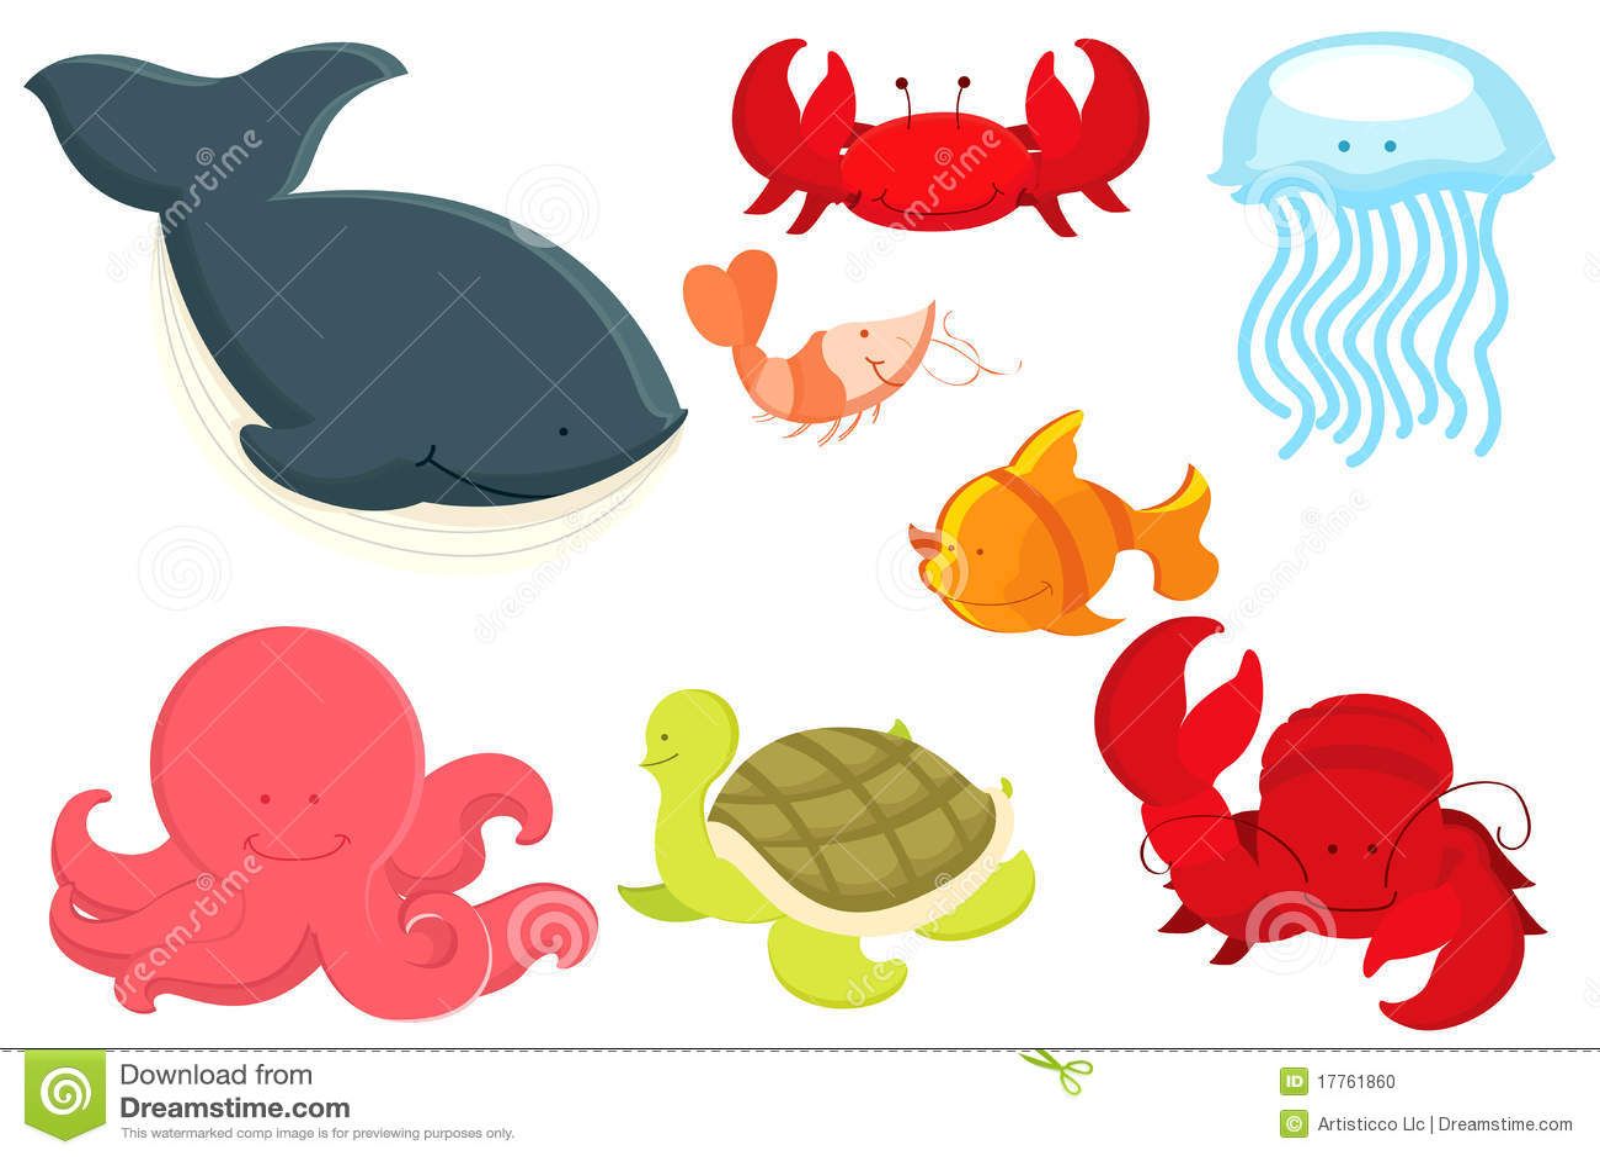 Dessin anim d 39 animaux marins photo stock image 17761860 - Dessin d animaux marins ...